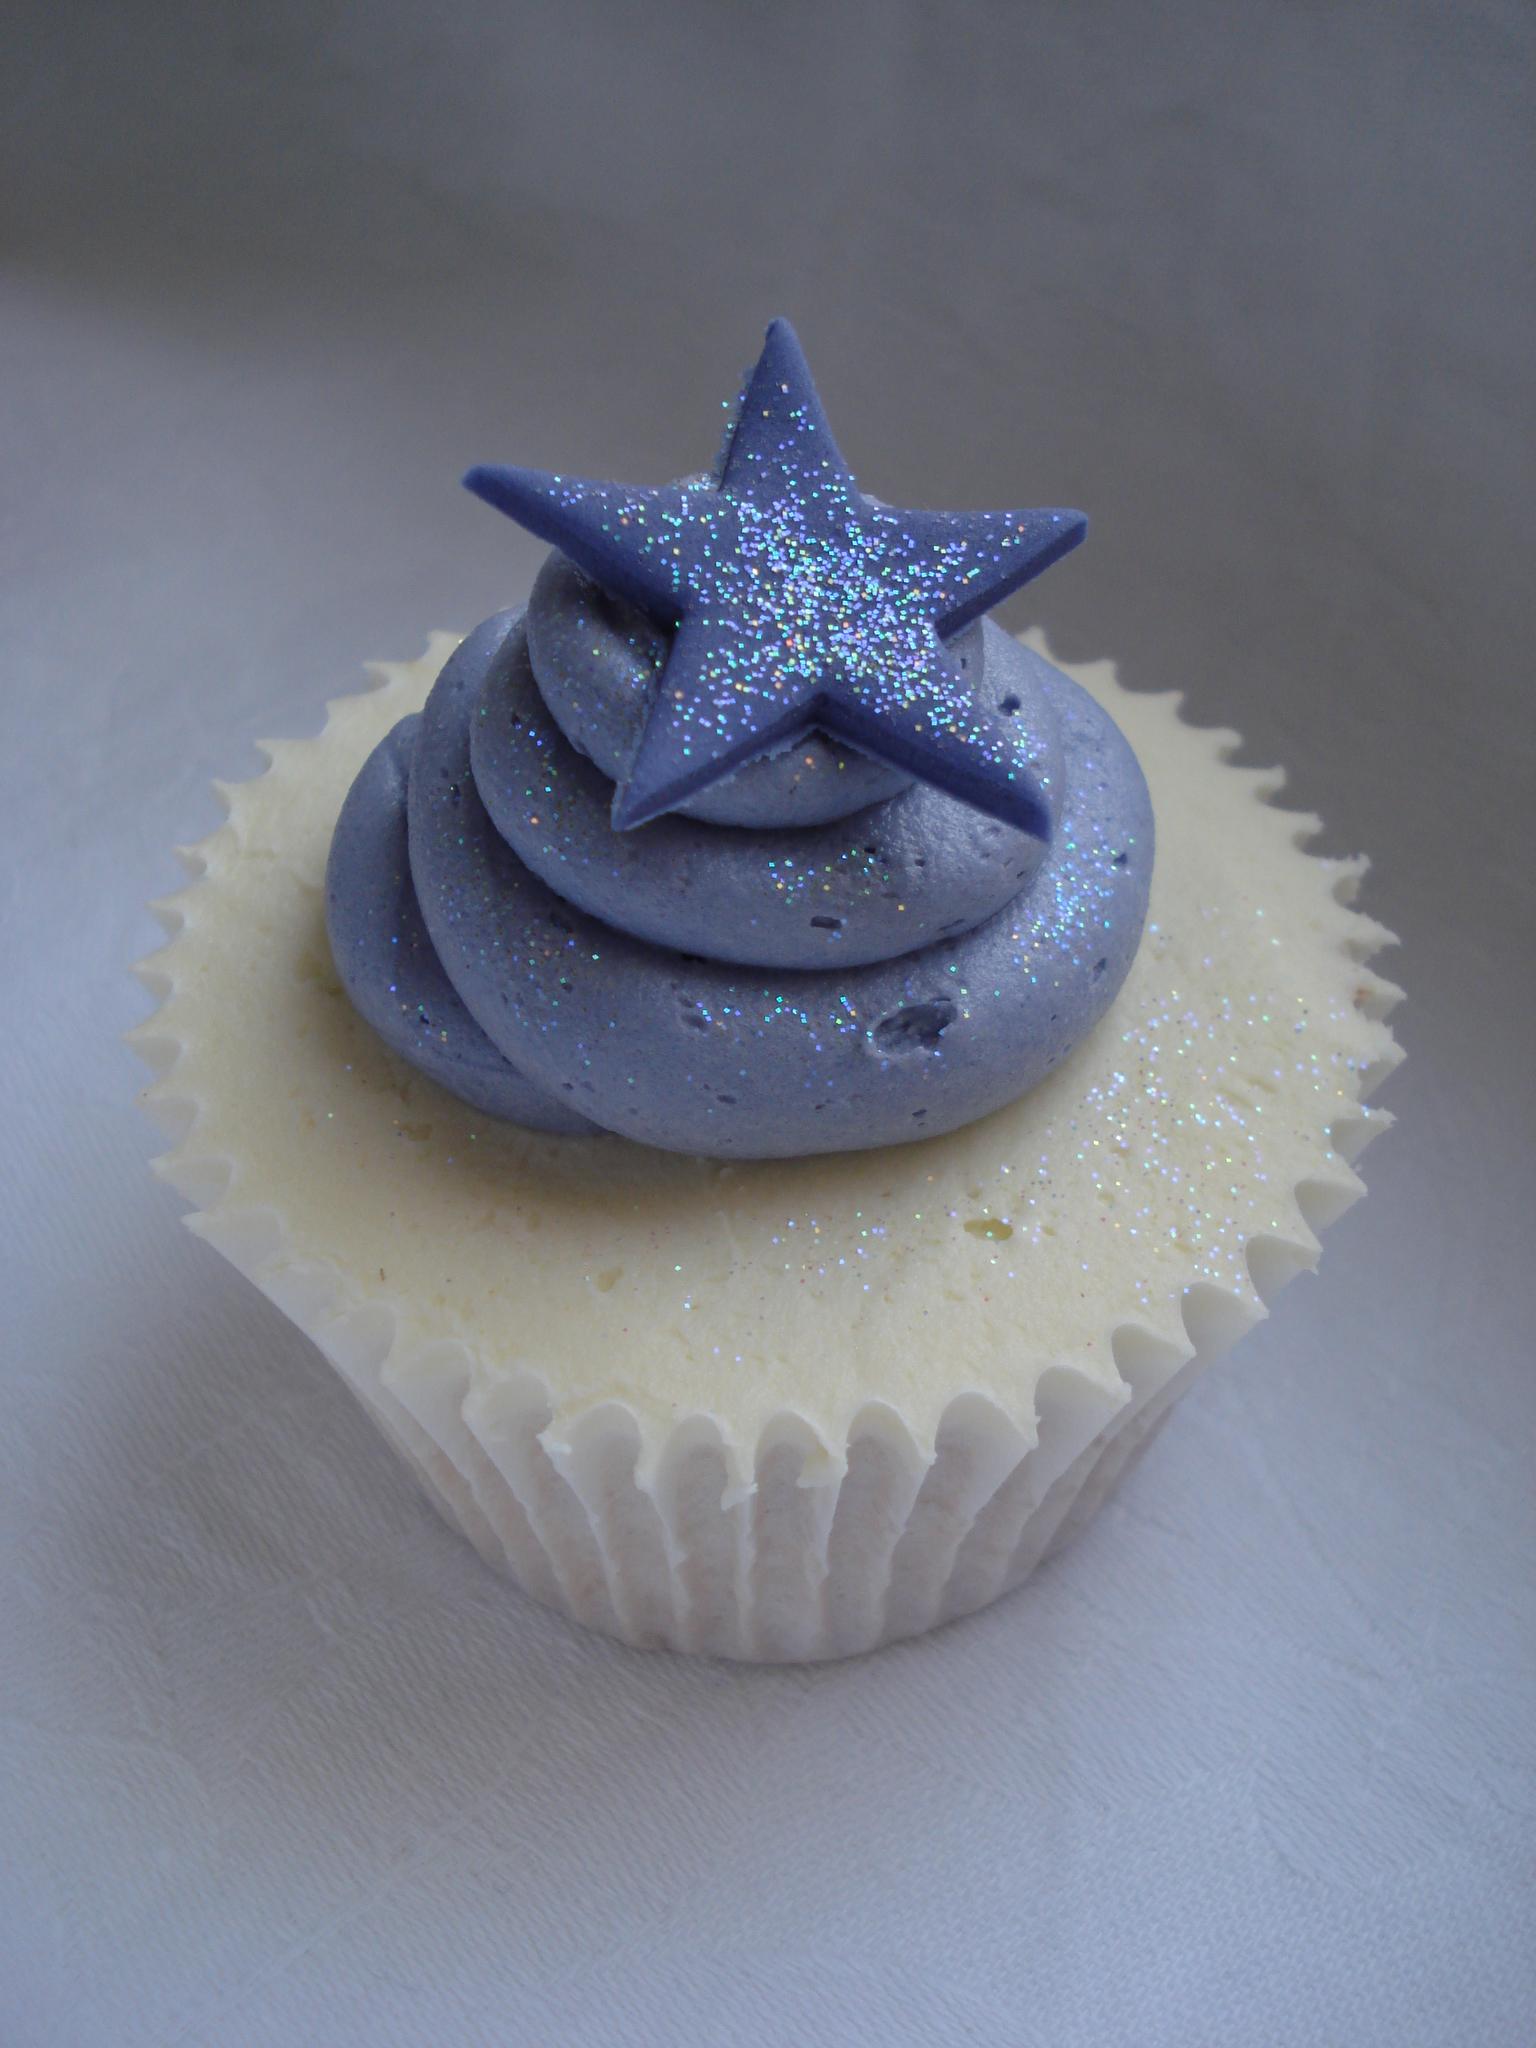 Lilac swirl and purple star cupcake